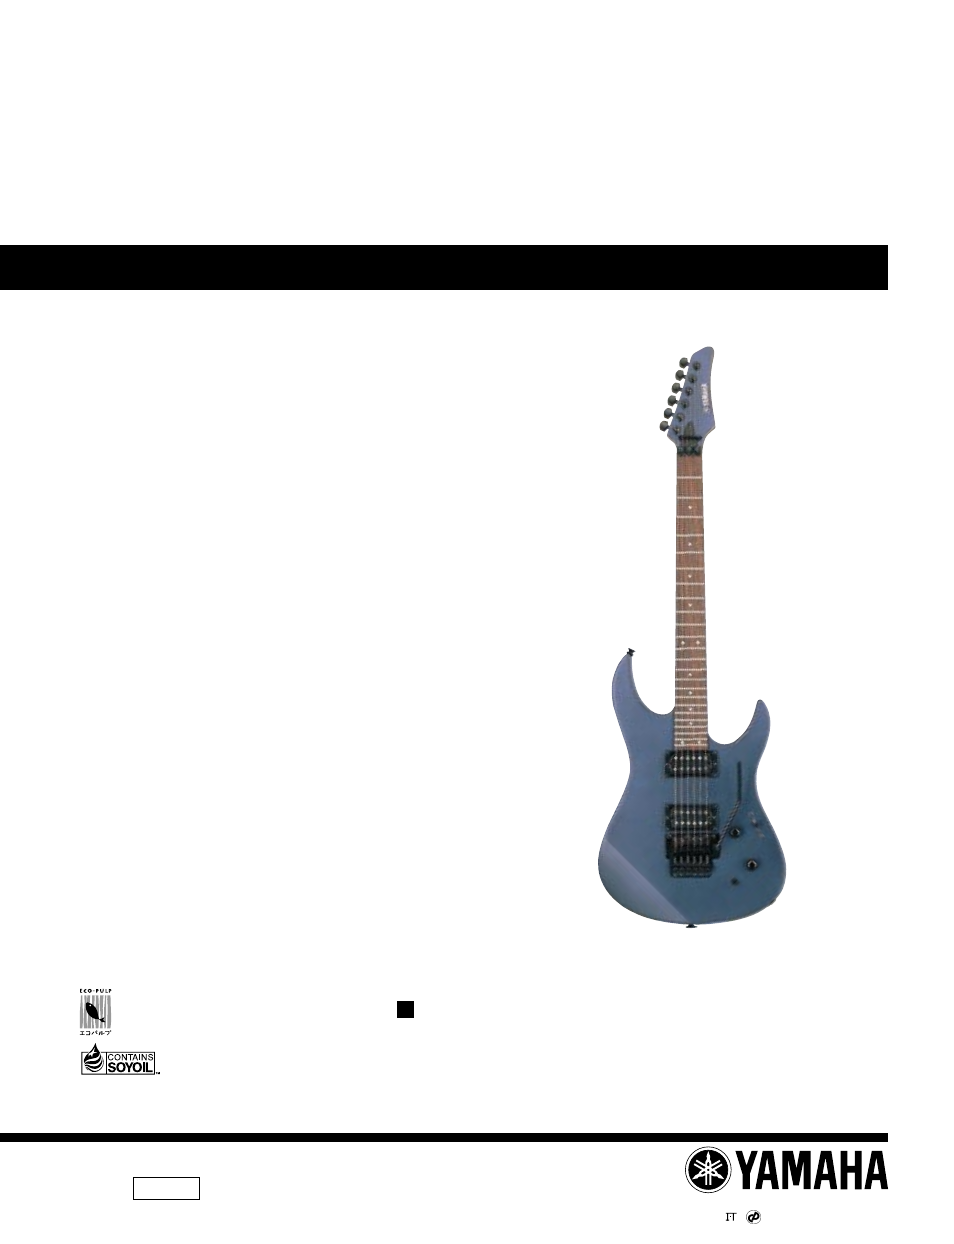 Yamaha Electric Guitar Rgx 420s User Manual 5 Pages Bass Wiring Diagram